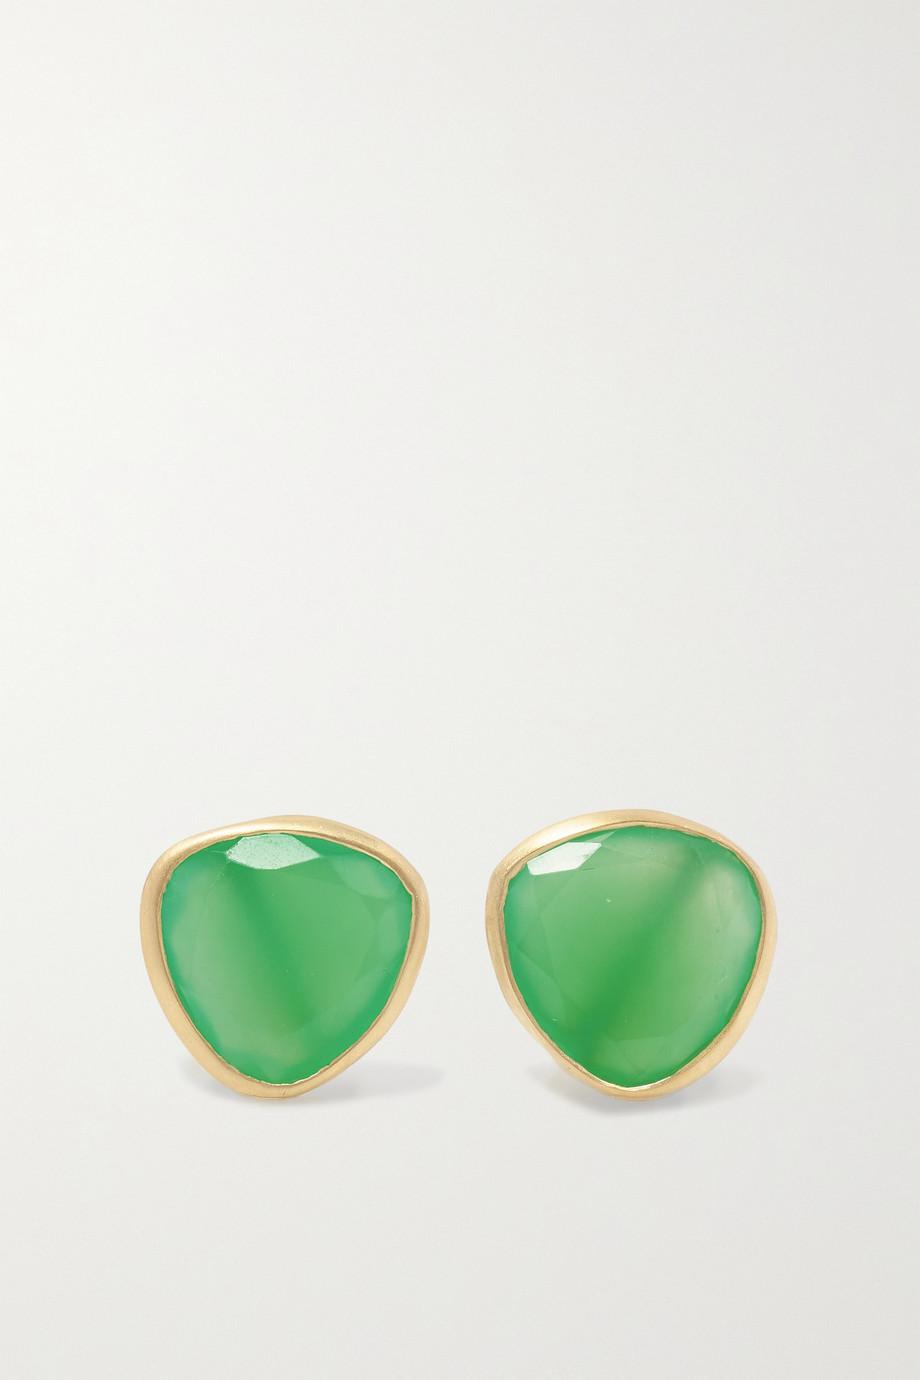 Pippa Small Large Classic 18-karat gold chrysoprase earrings